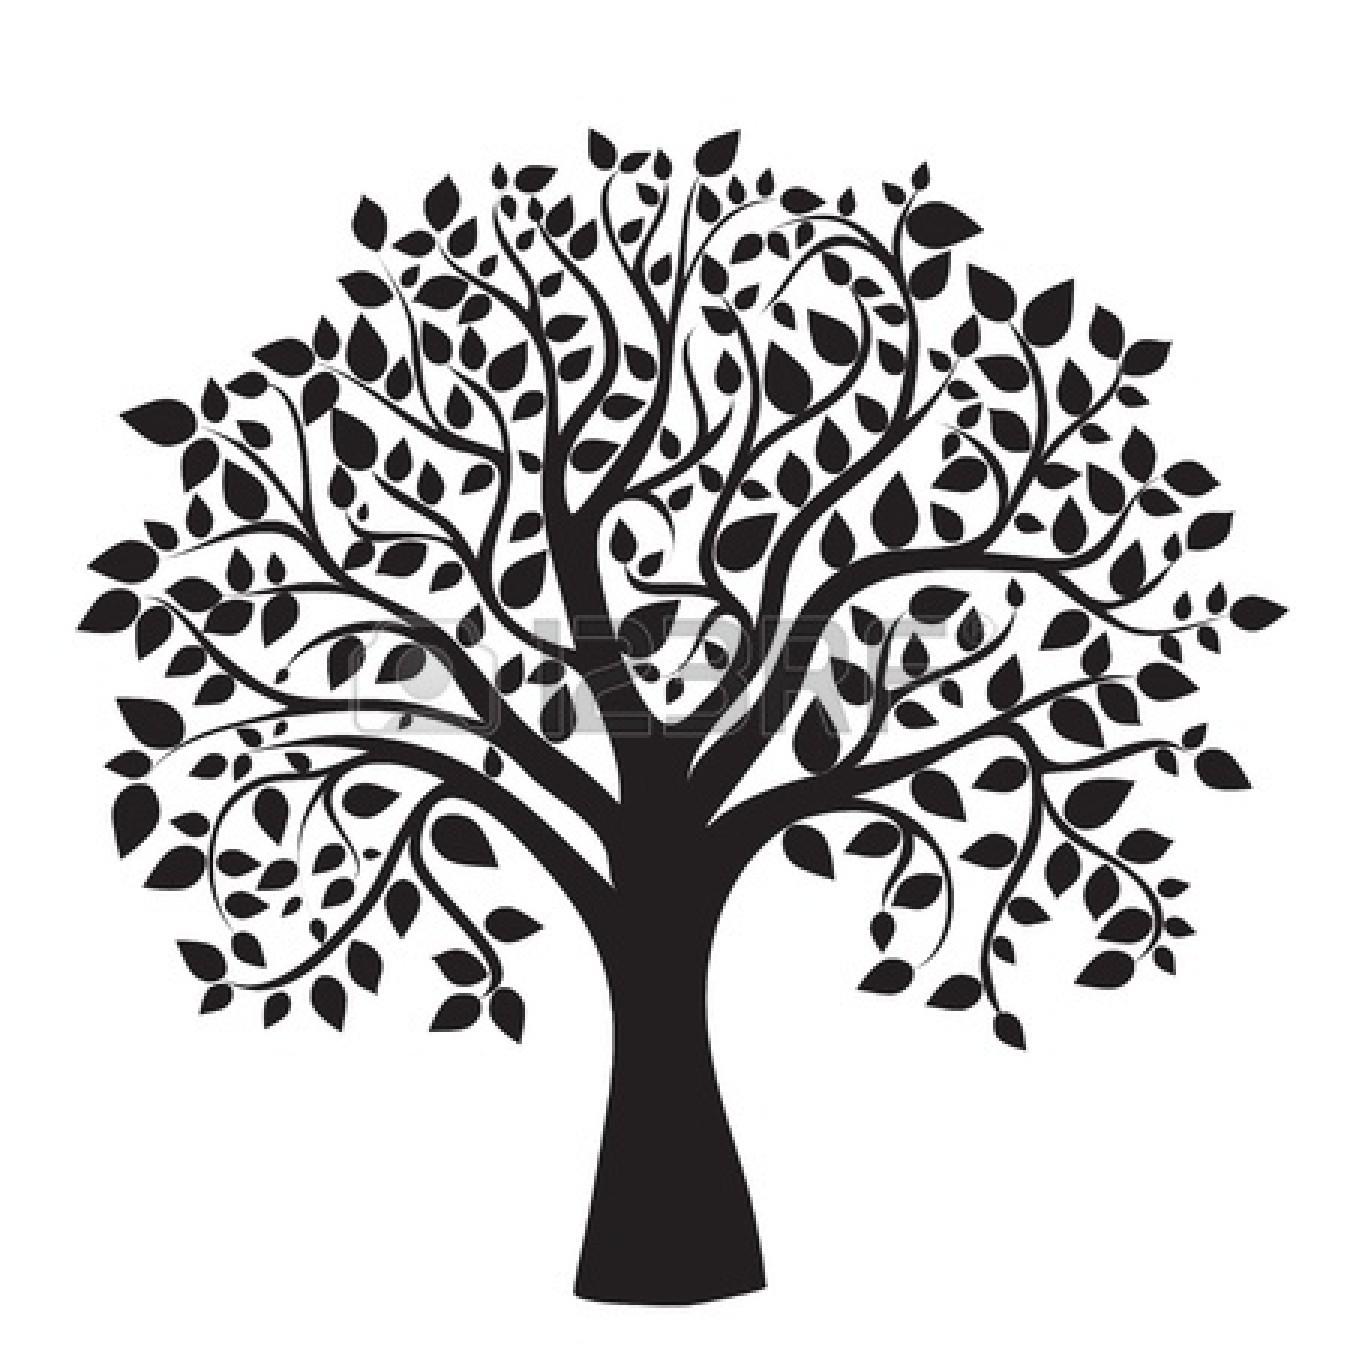 family reunion clipart. Famil - Family Reunion Tree Clip Art